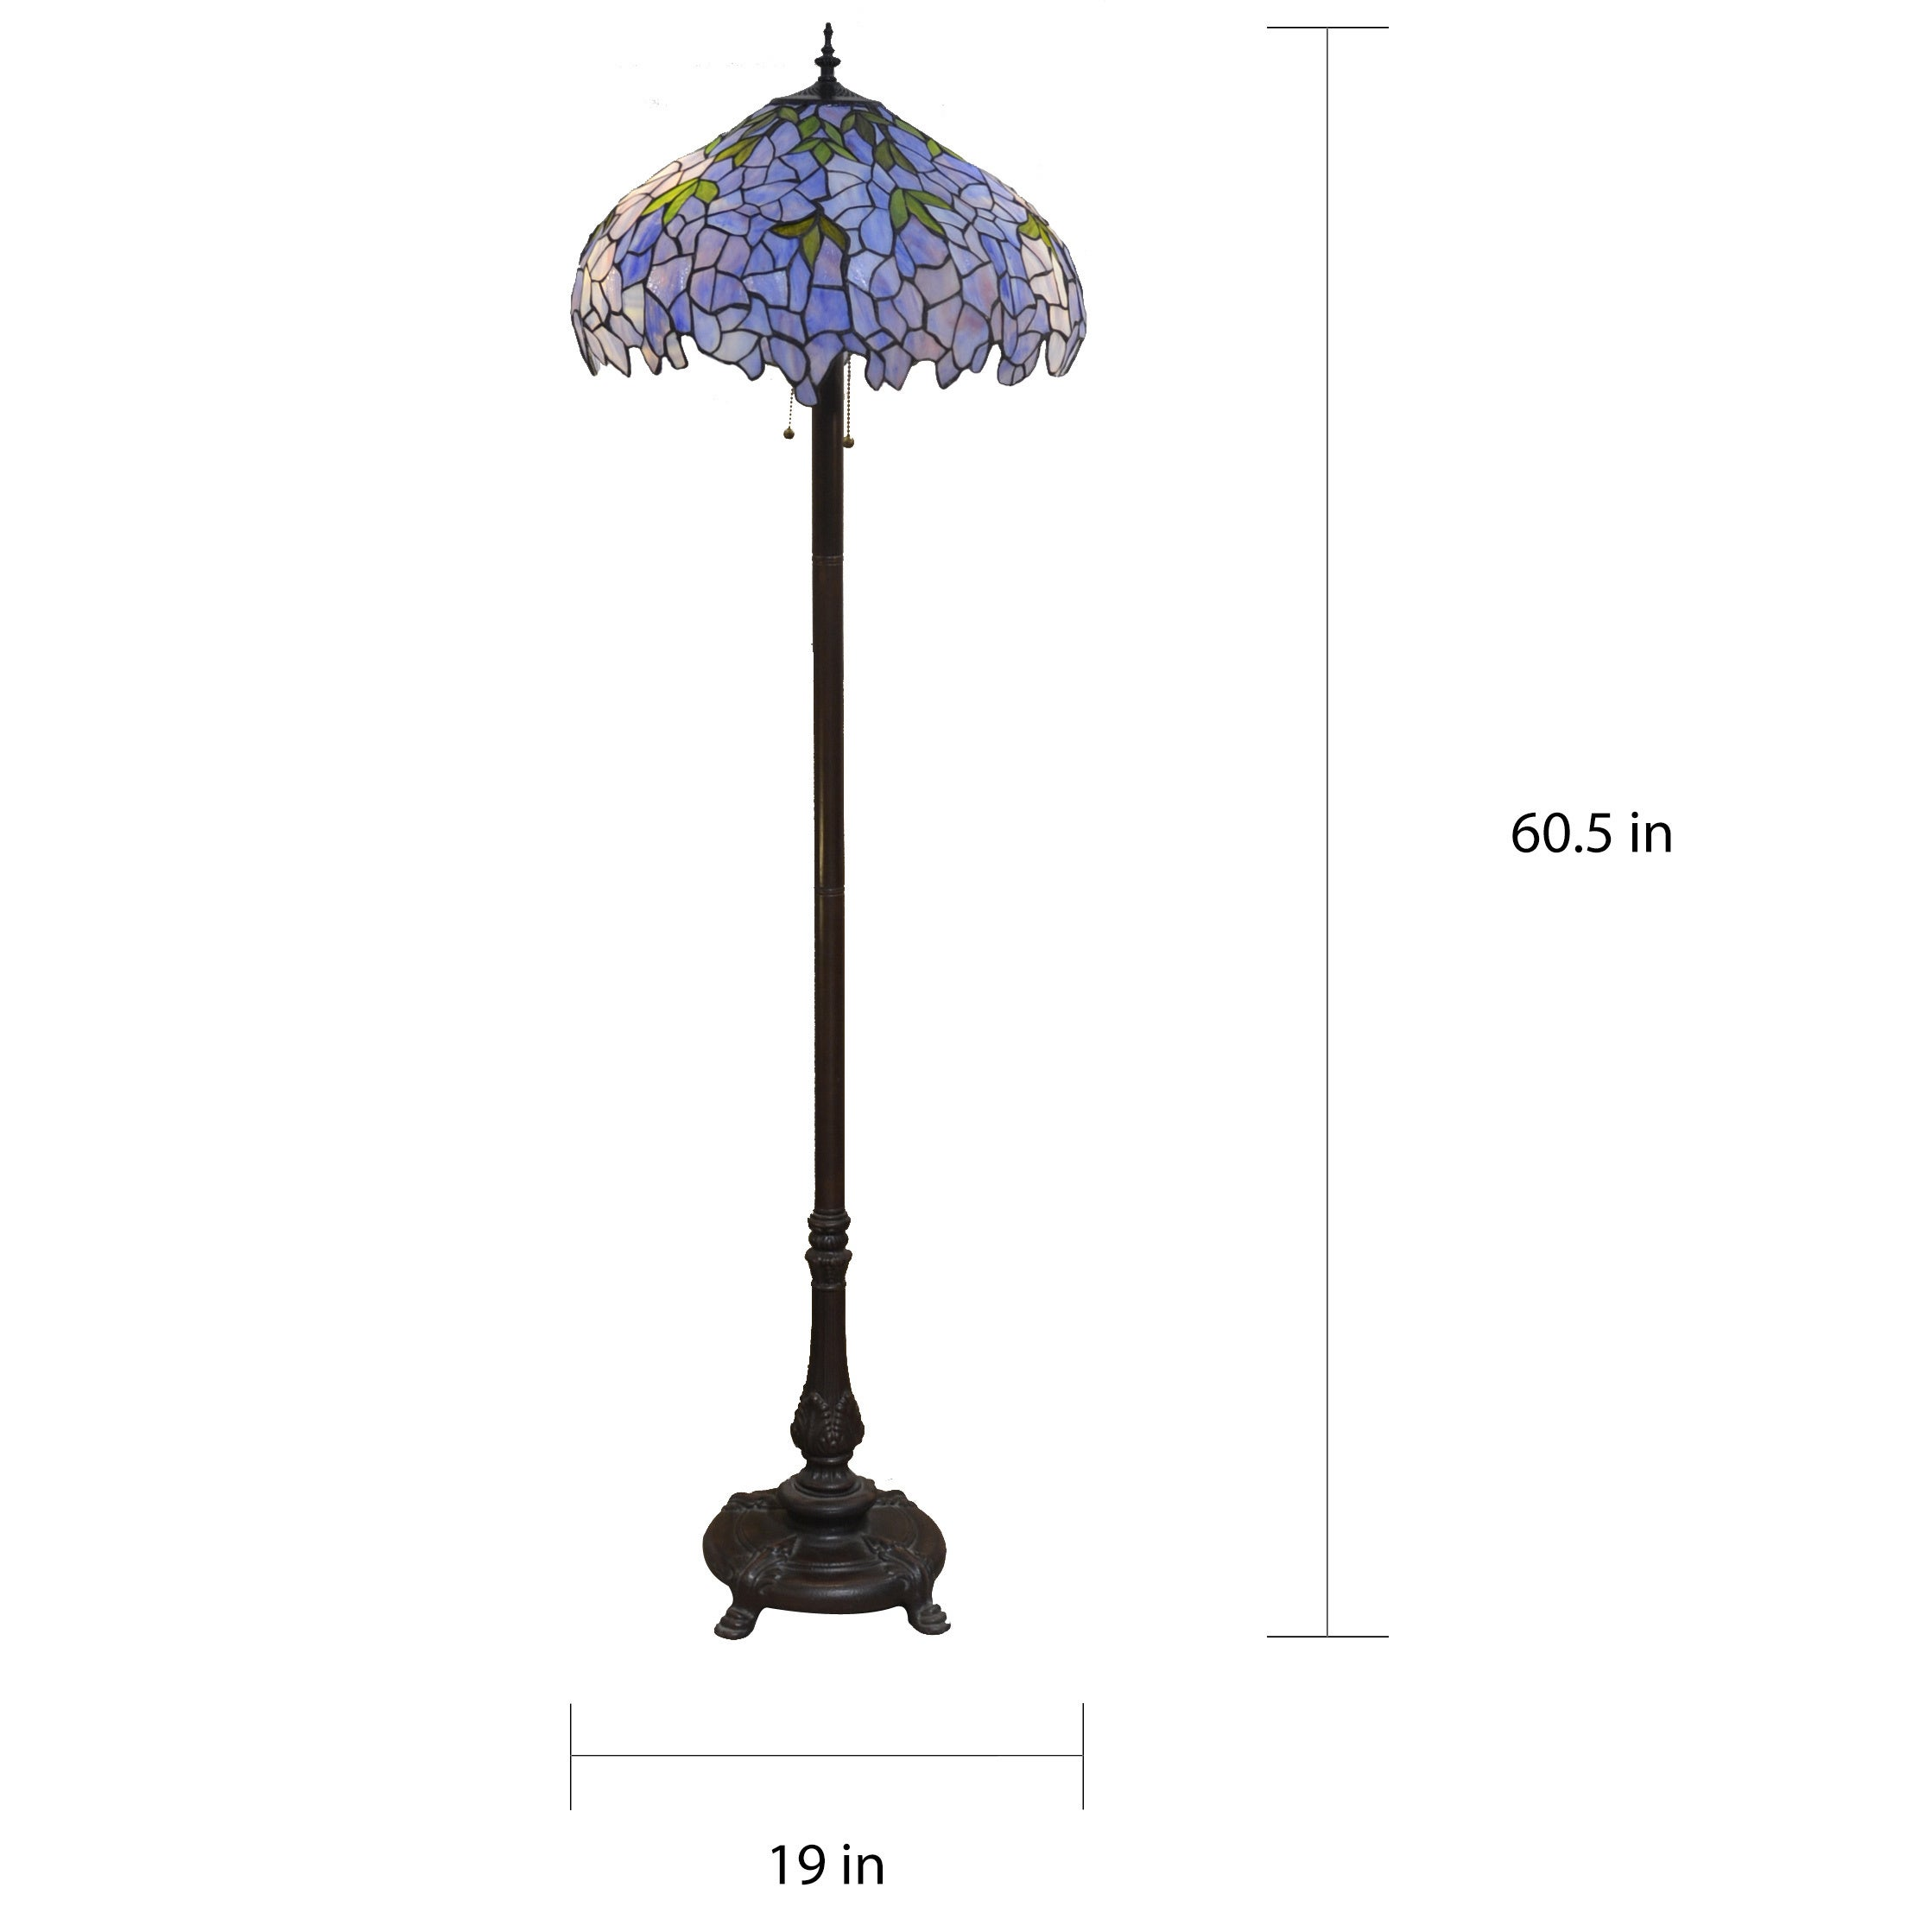 Tiffany Style 19 Inch Floor Lamp